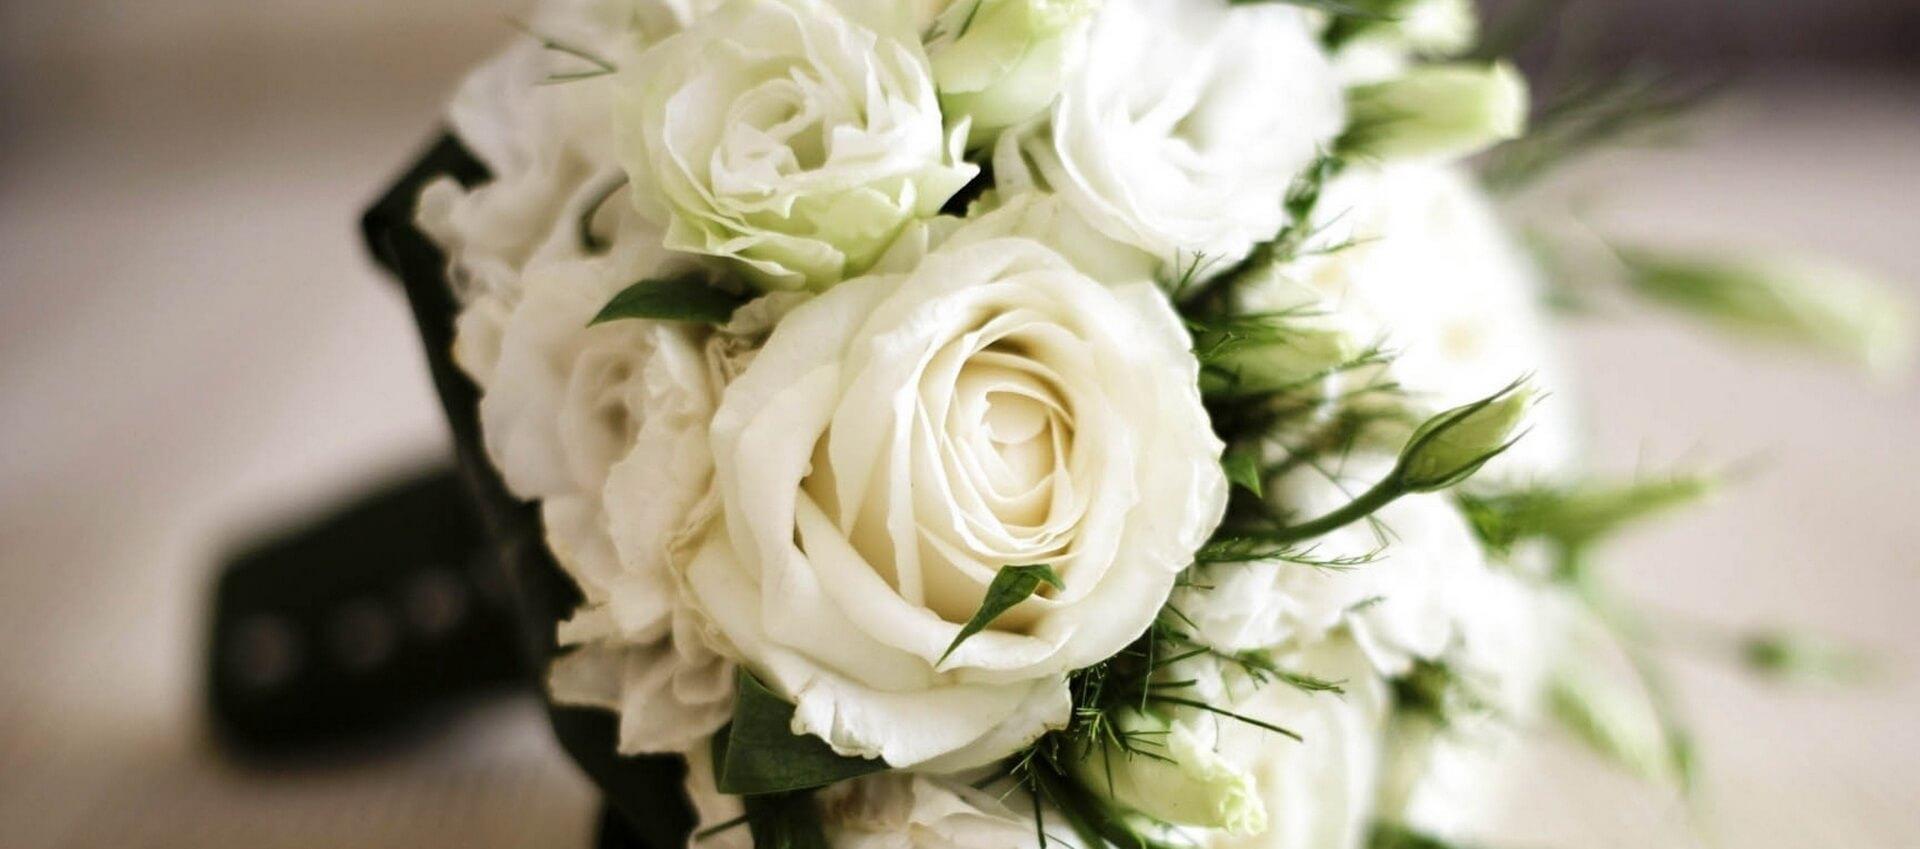 فروش دسته گل عروس